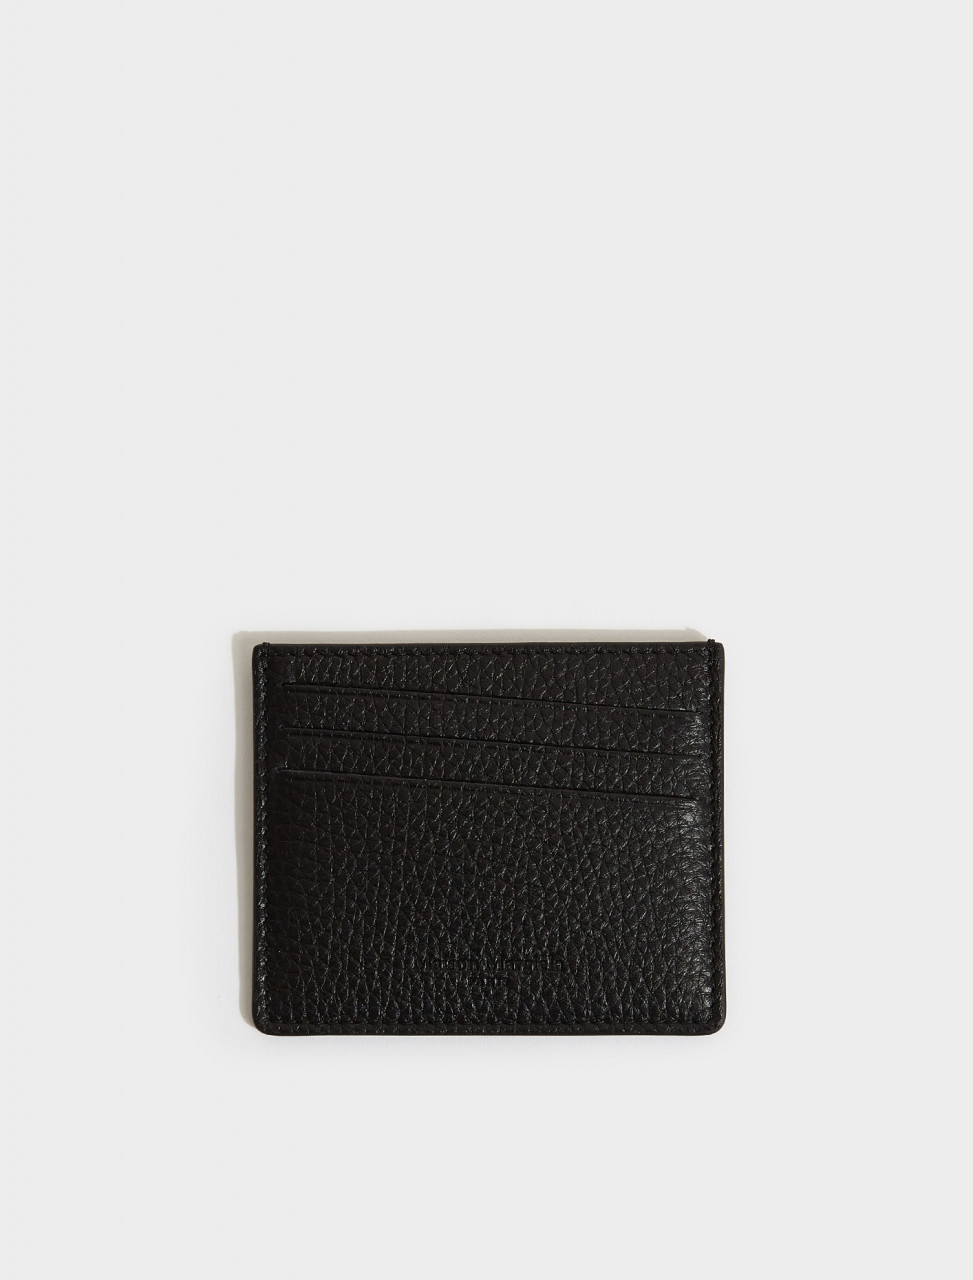 S35UI0432-H1669 MAISON MARGIELA CARD HOLDER IN BLACK